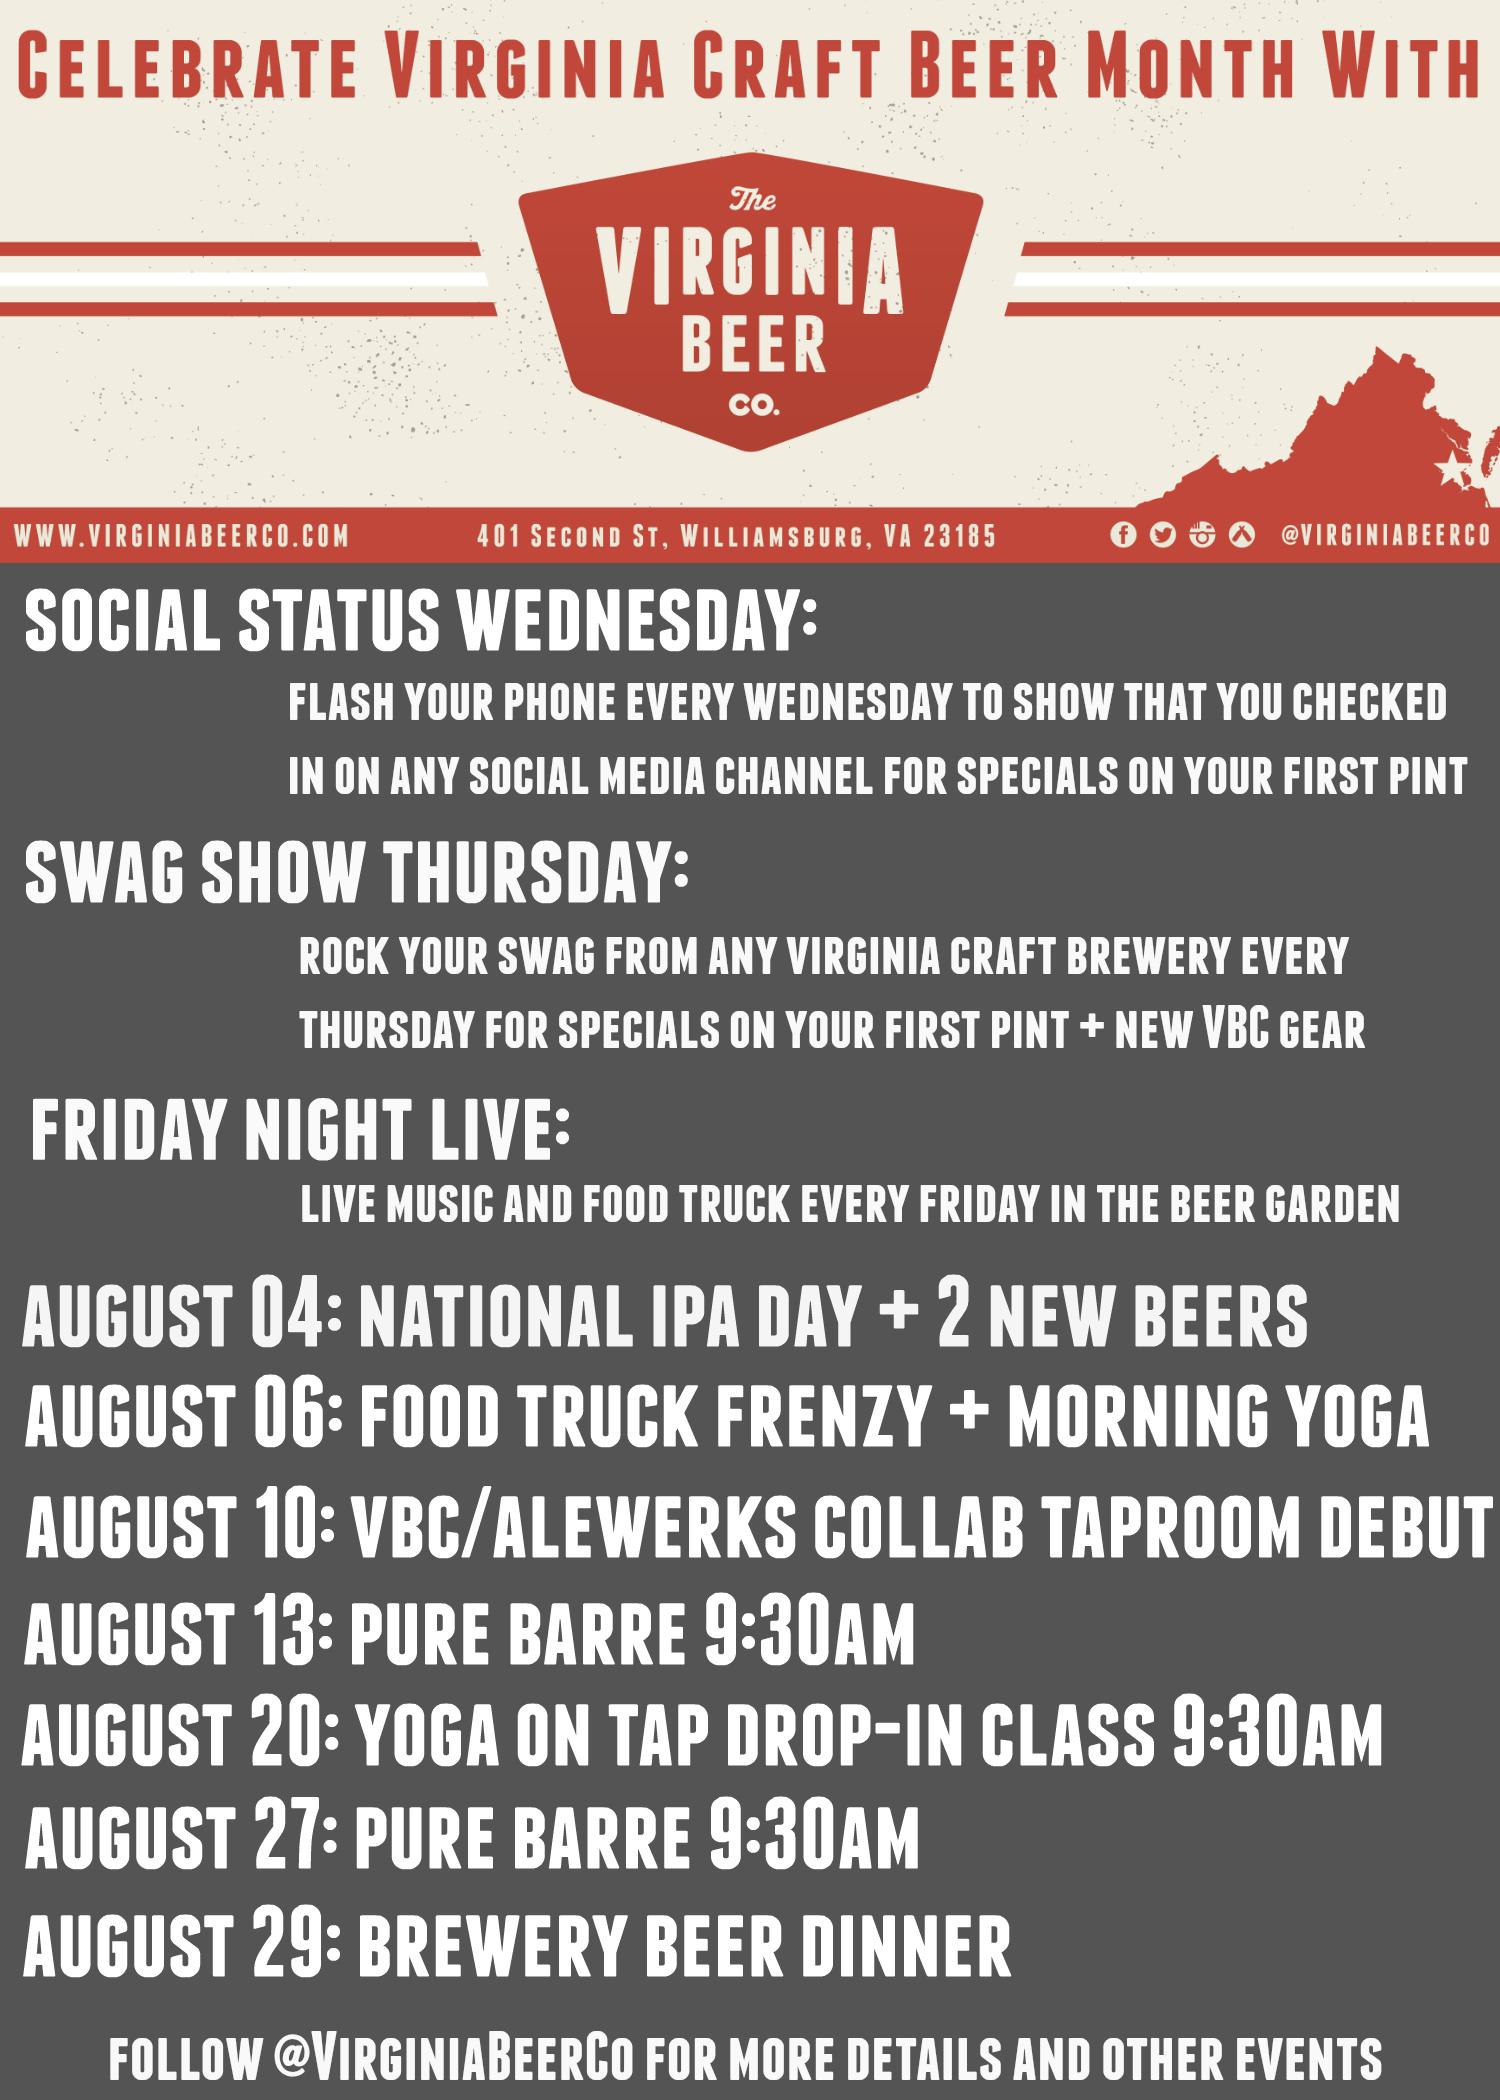 VBC VA craft beer month 5x7 postcard side 1.jpg